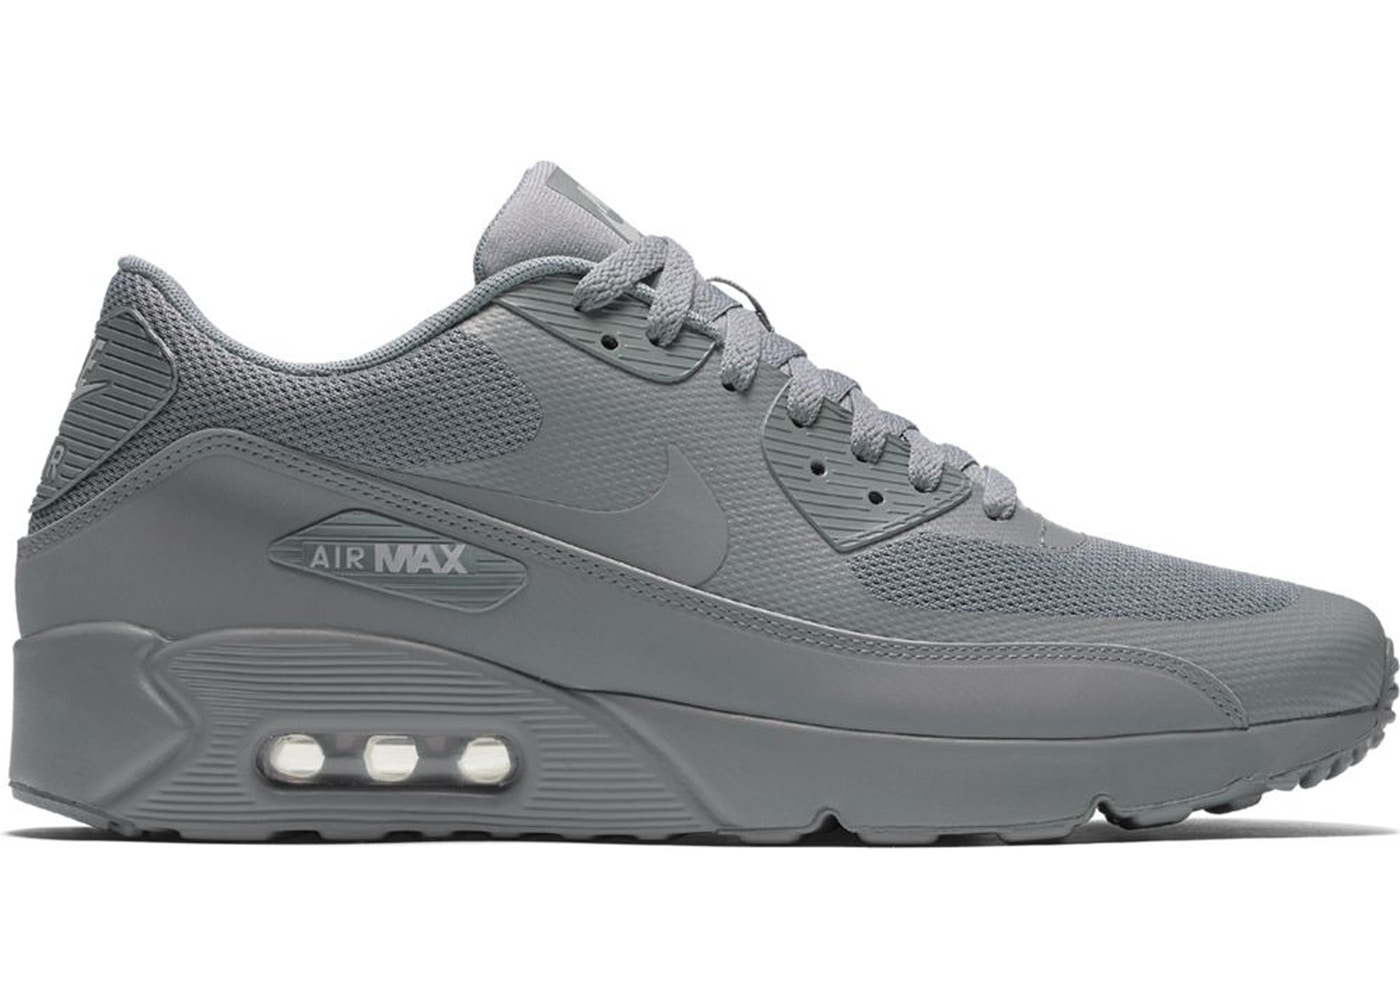 Nike Air Max 90 Ultra 2.0 Cool Grey - 875695-003